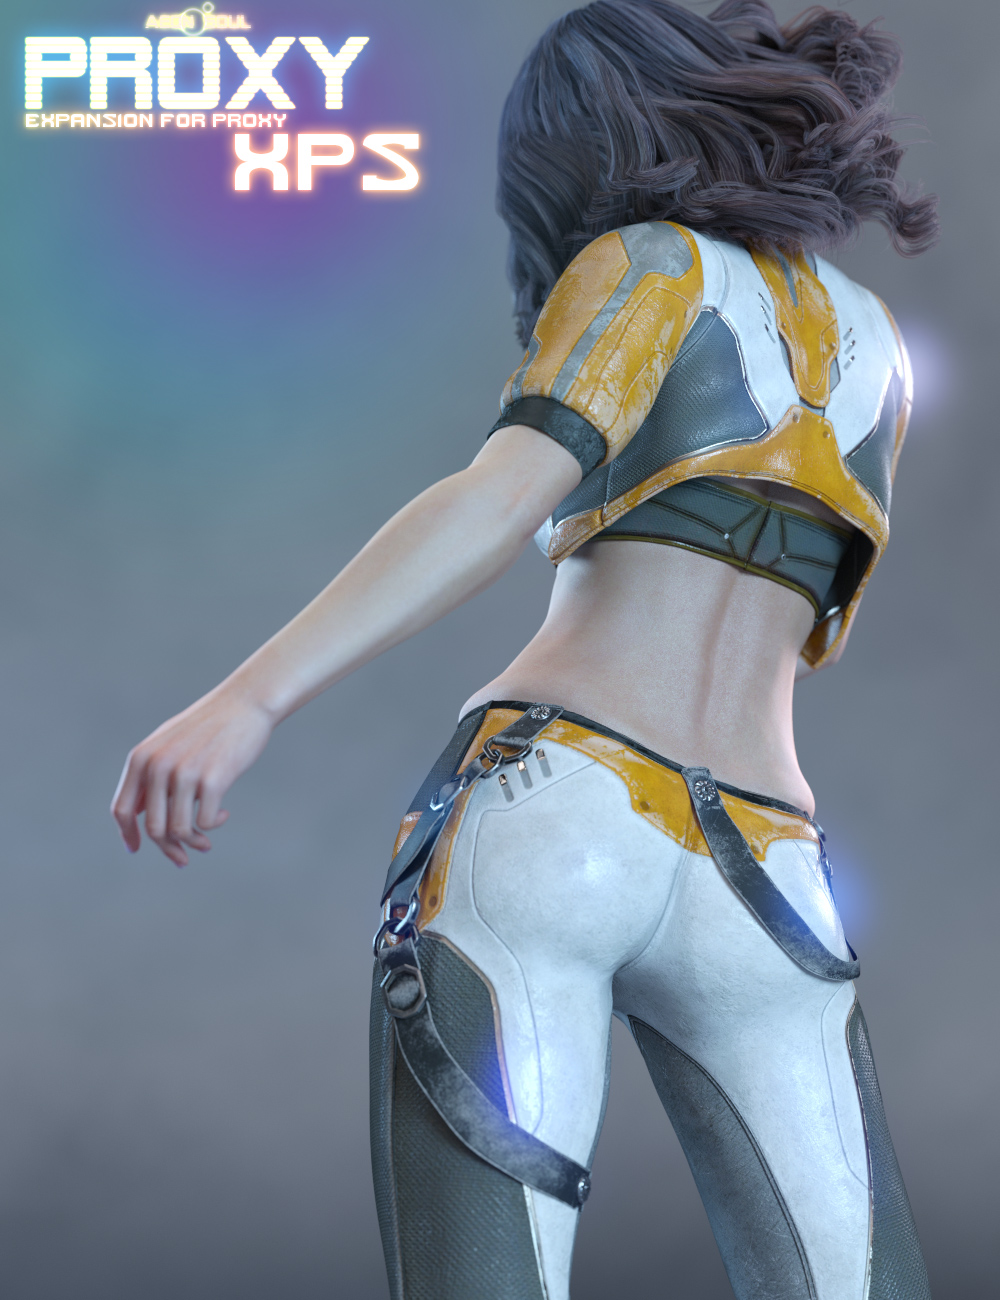 Proxy XPS: Tau Ceti Futuristic Styles for Proxy by: Aeon Soul, 3D Models by Daz 3D